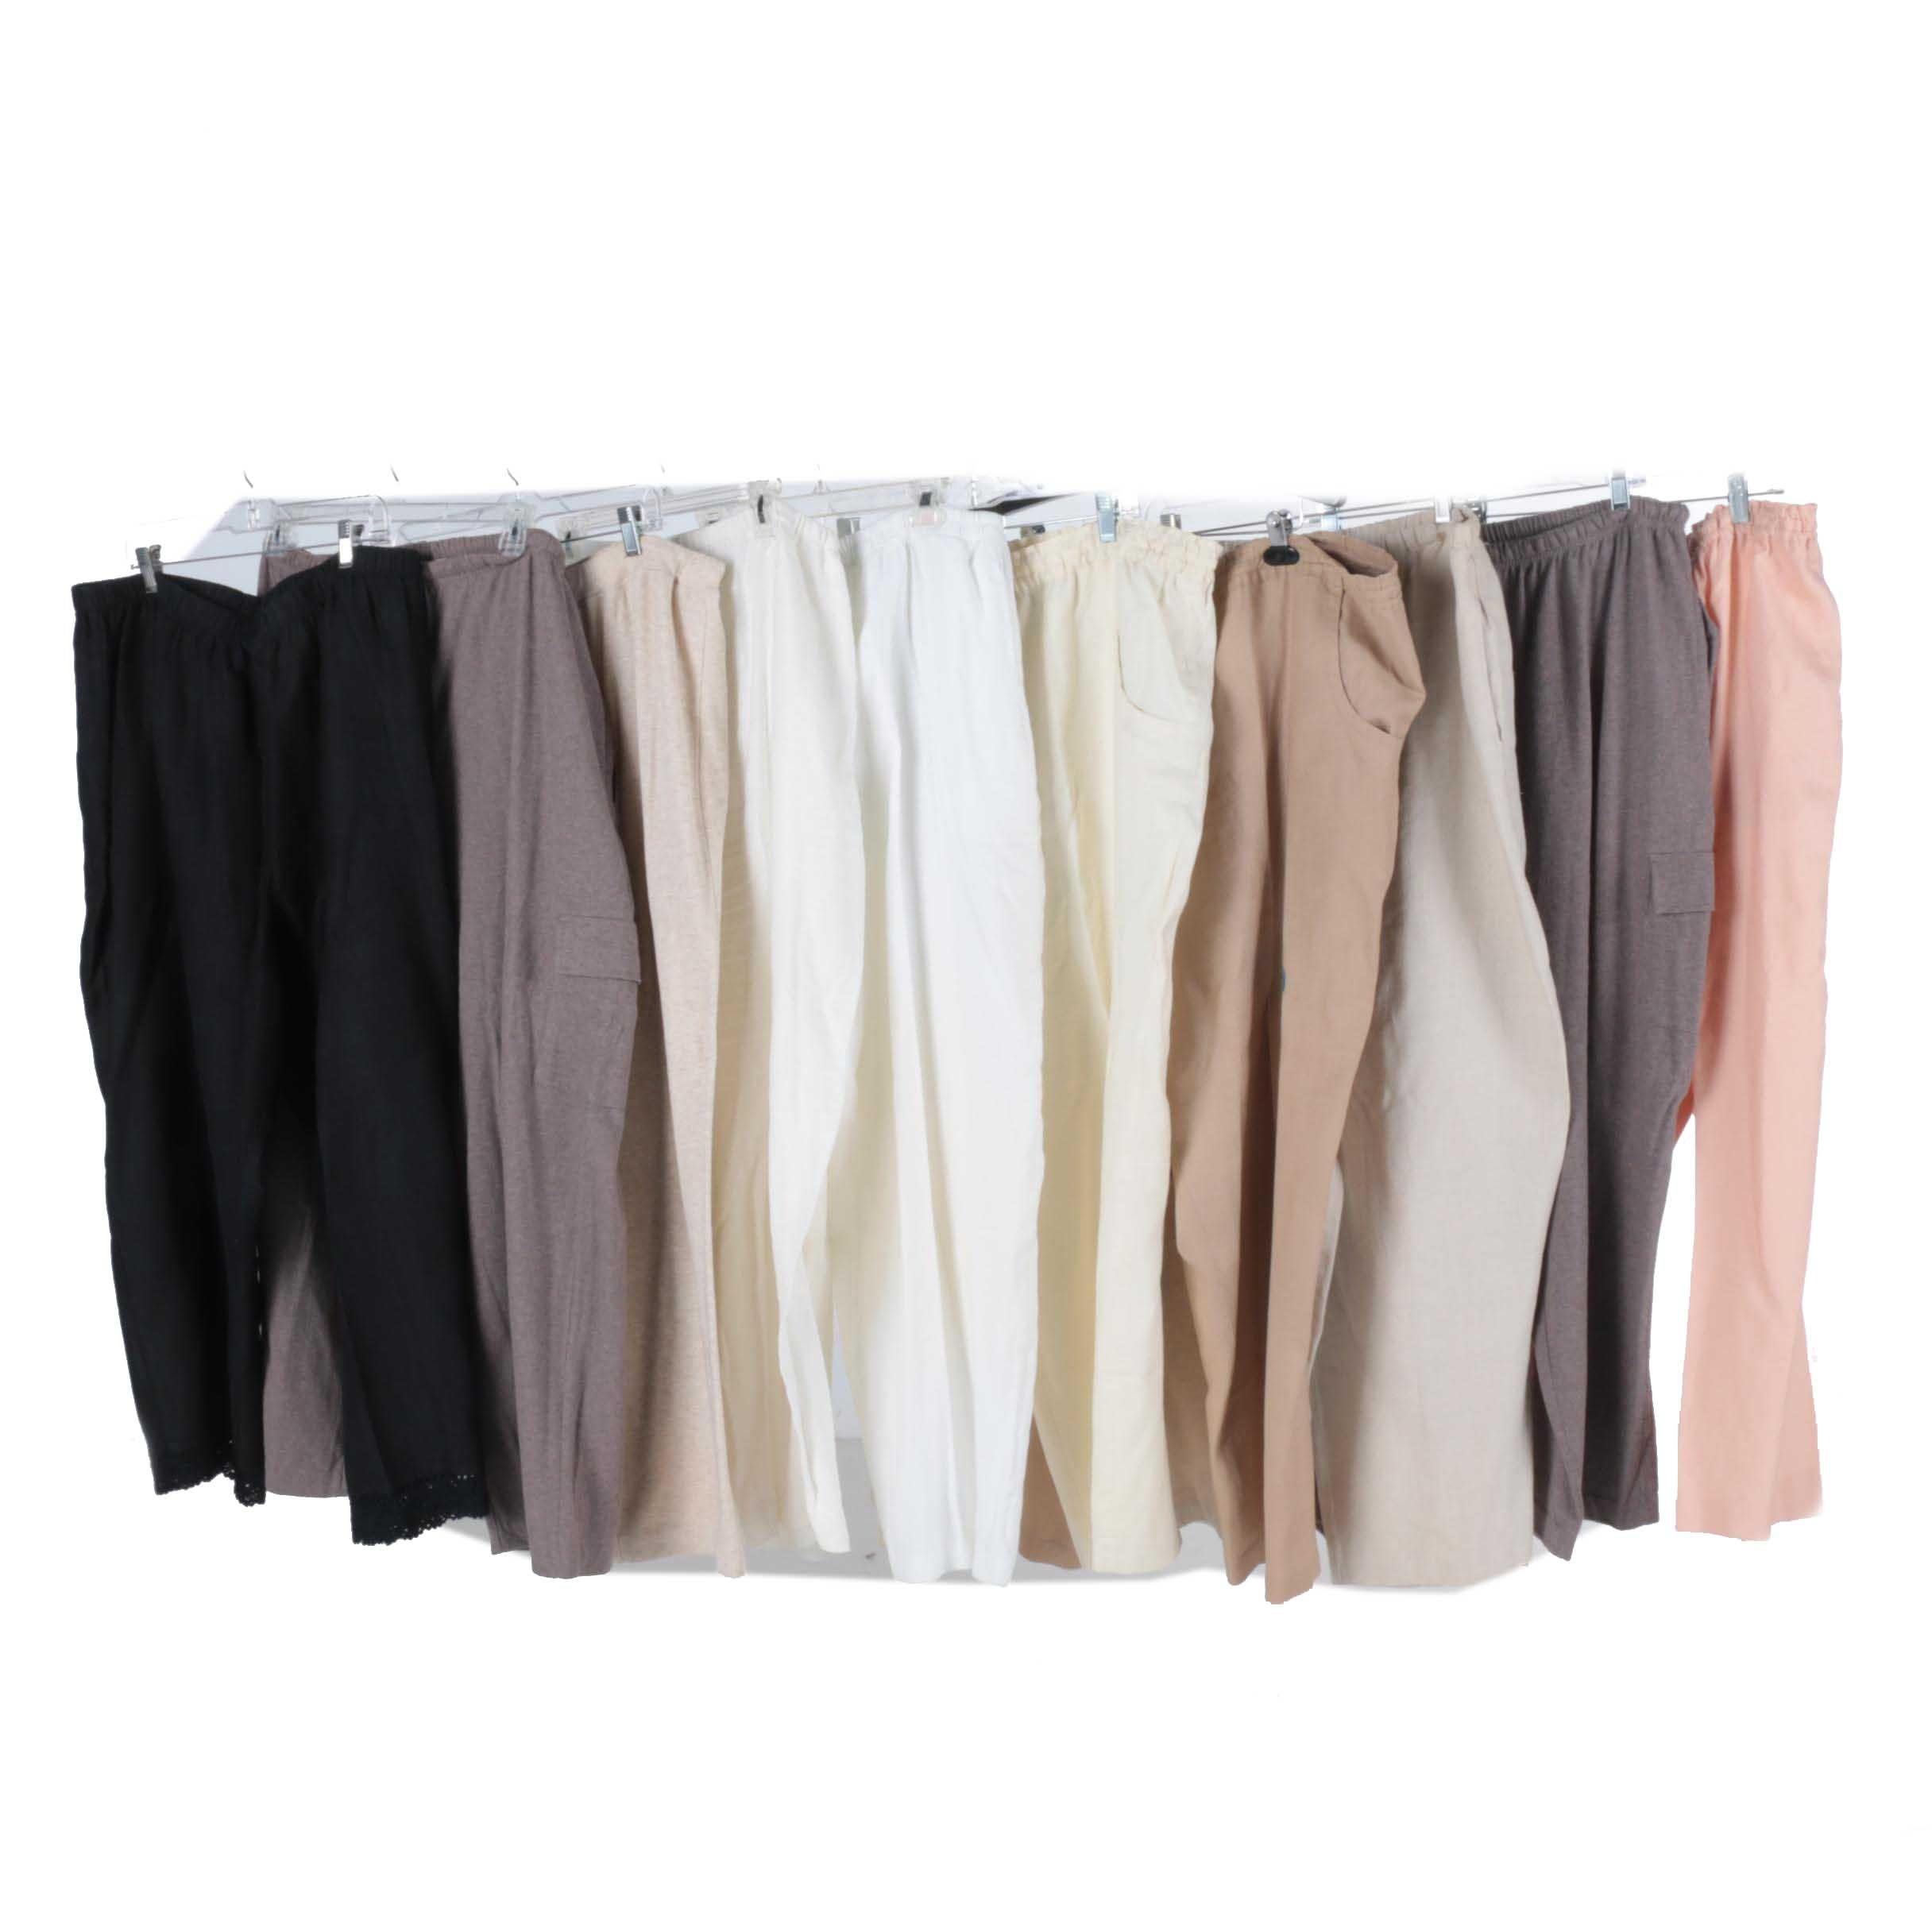 Women's Plus Size Pants Including Jones New York and J. Jill